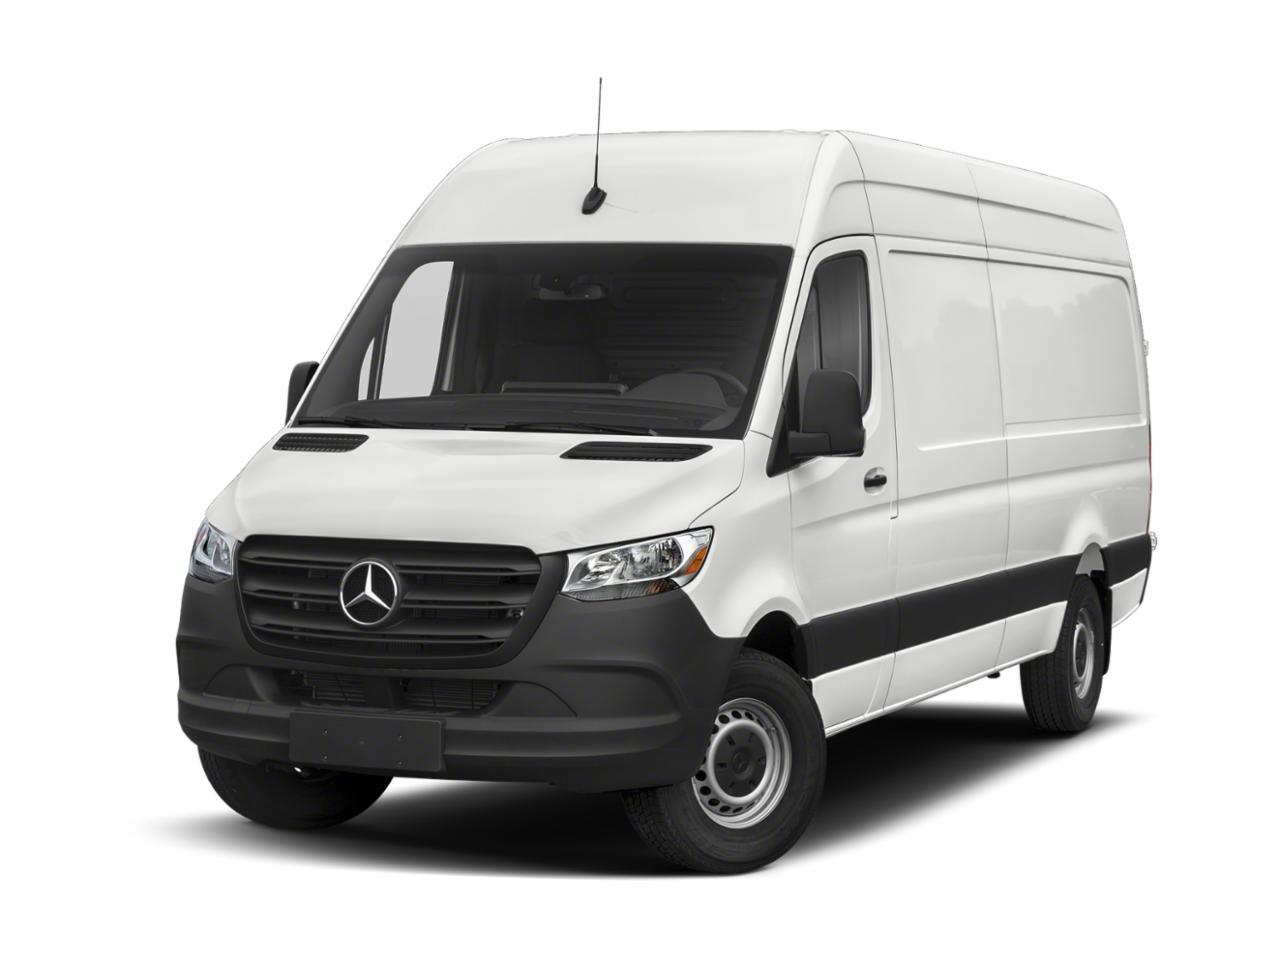 2019 Mercedes-Benz Sprinter Cargo Van Vehicle Photo in AKRON, OH 44320-4088